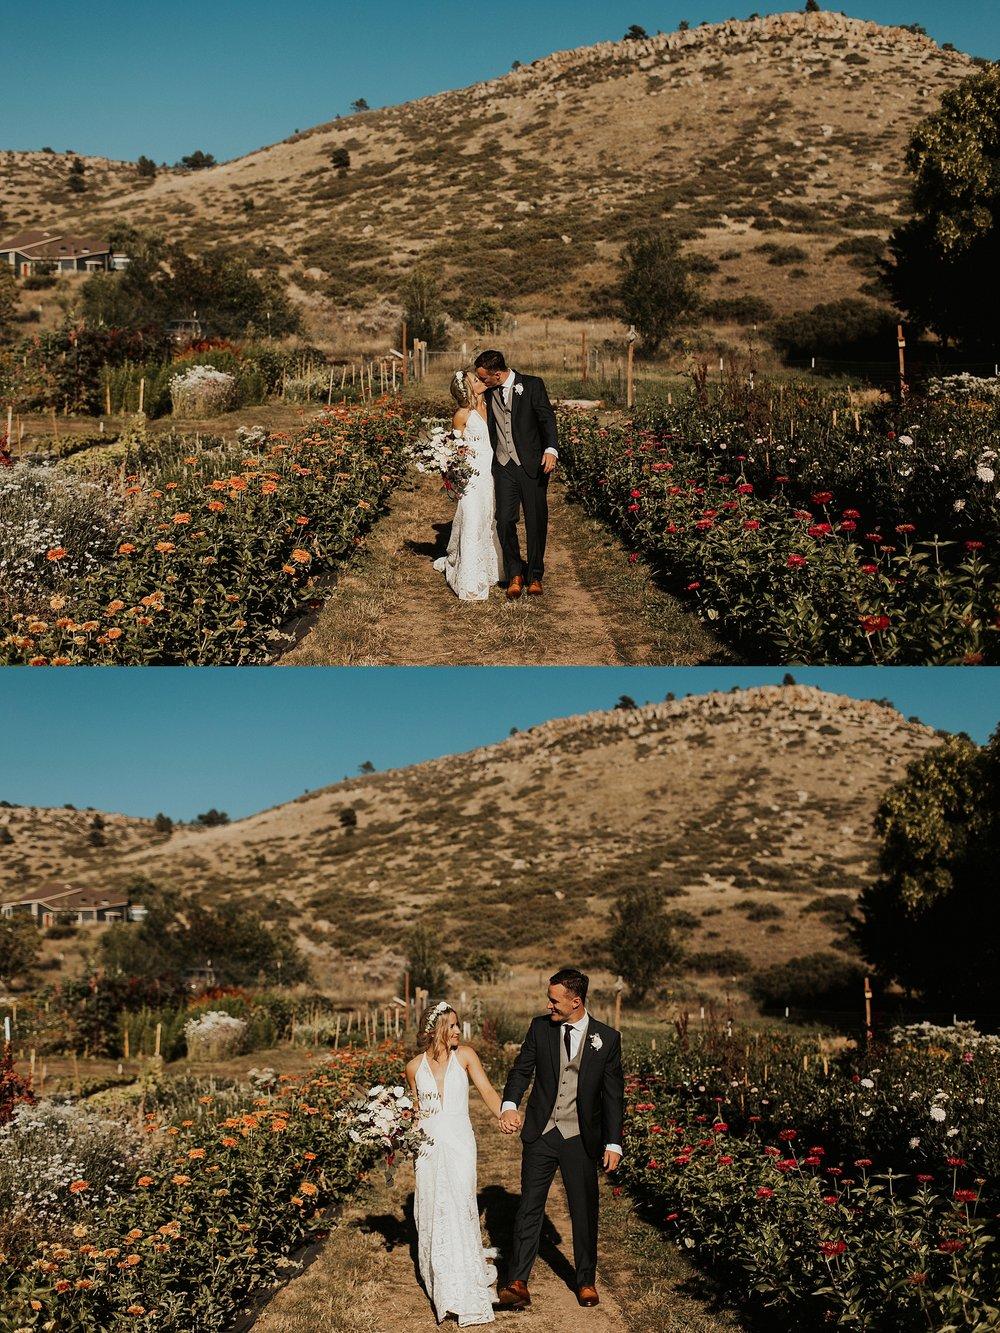 Lyons_Farmette_Wedding_Denver_Colorado_wedding061.JPG